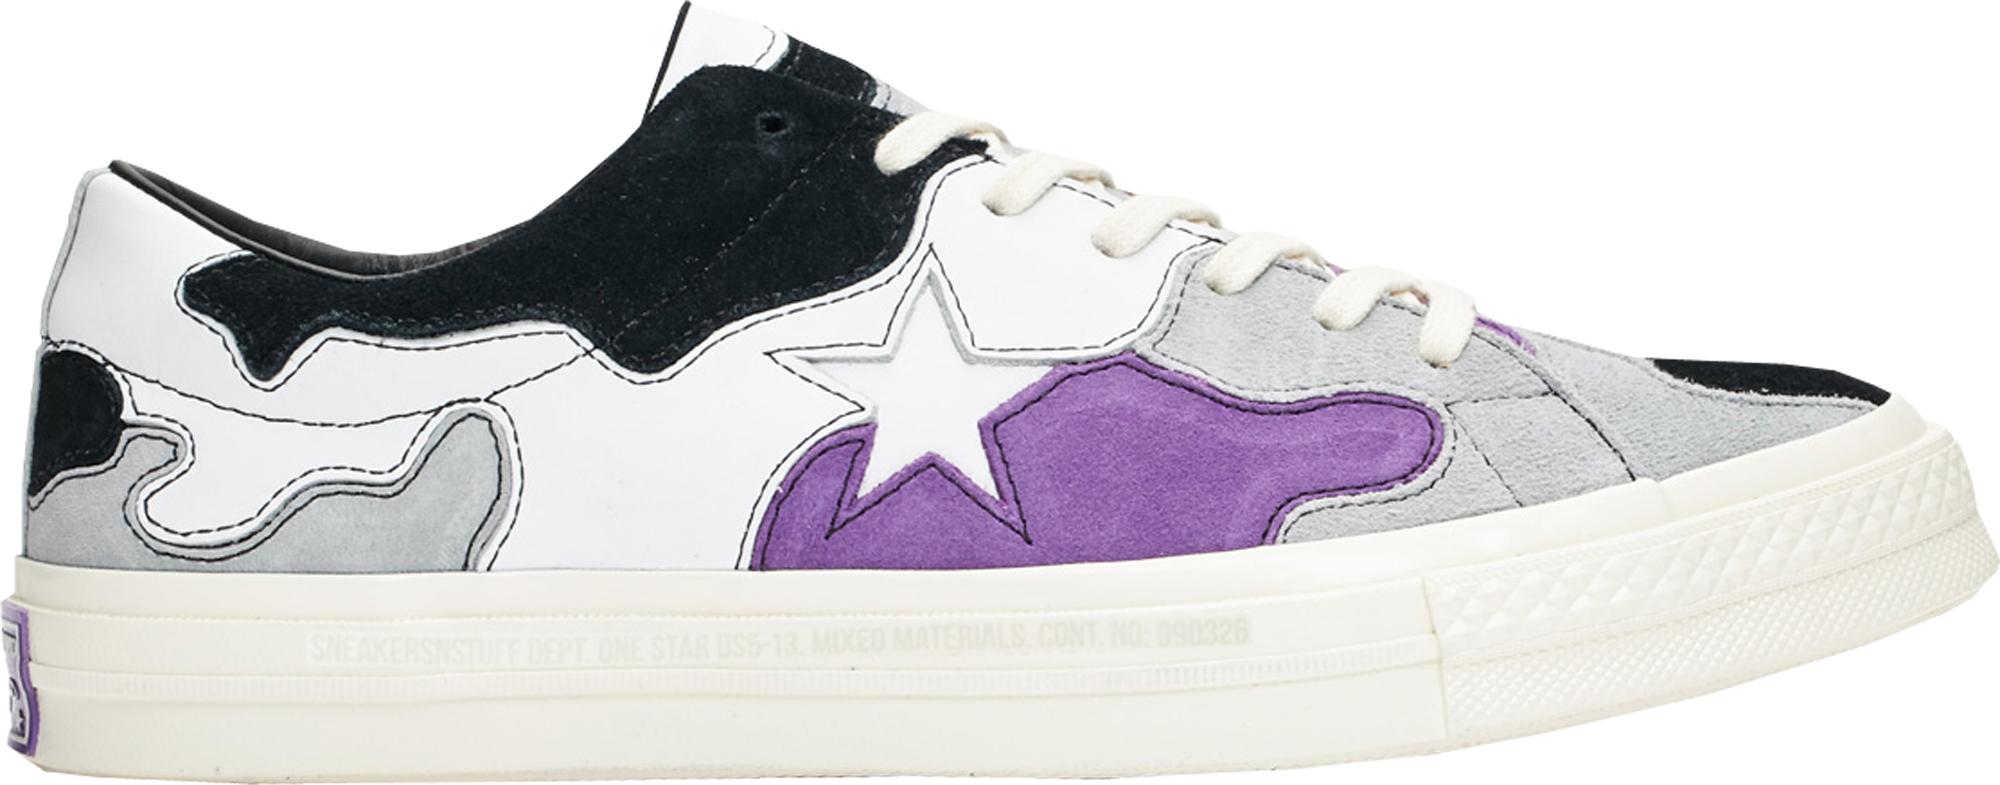 Converse One Star SNS Camo (Purple